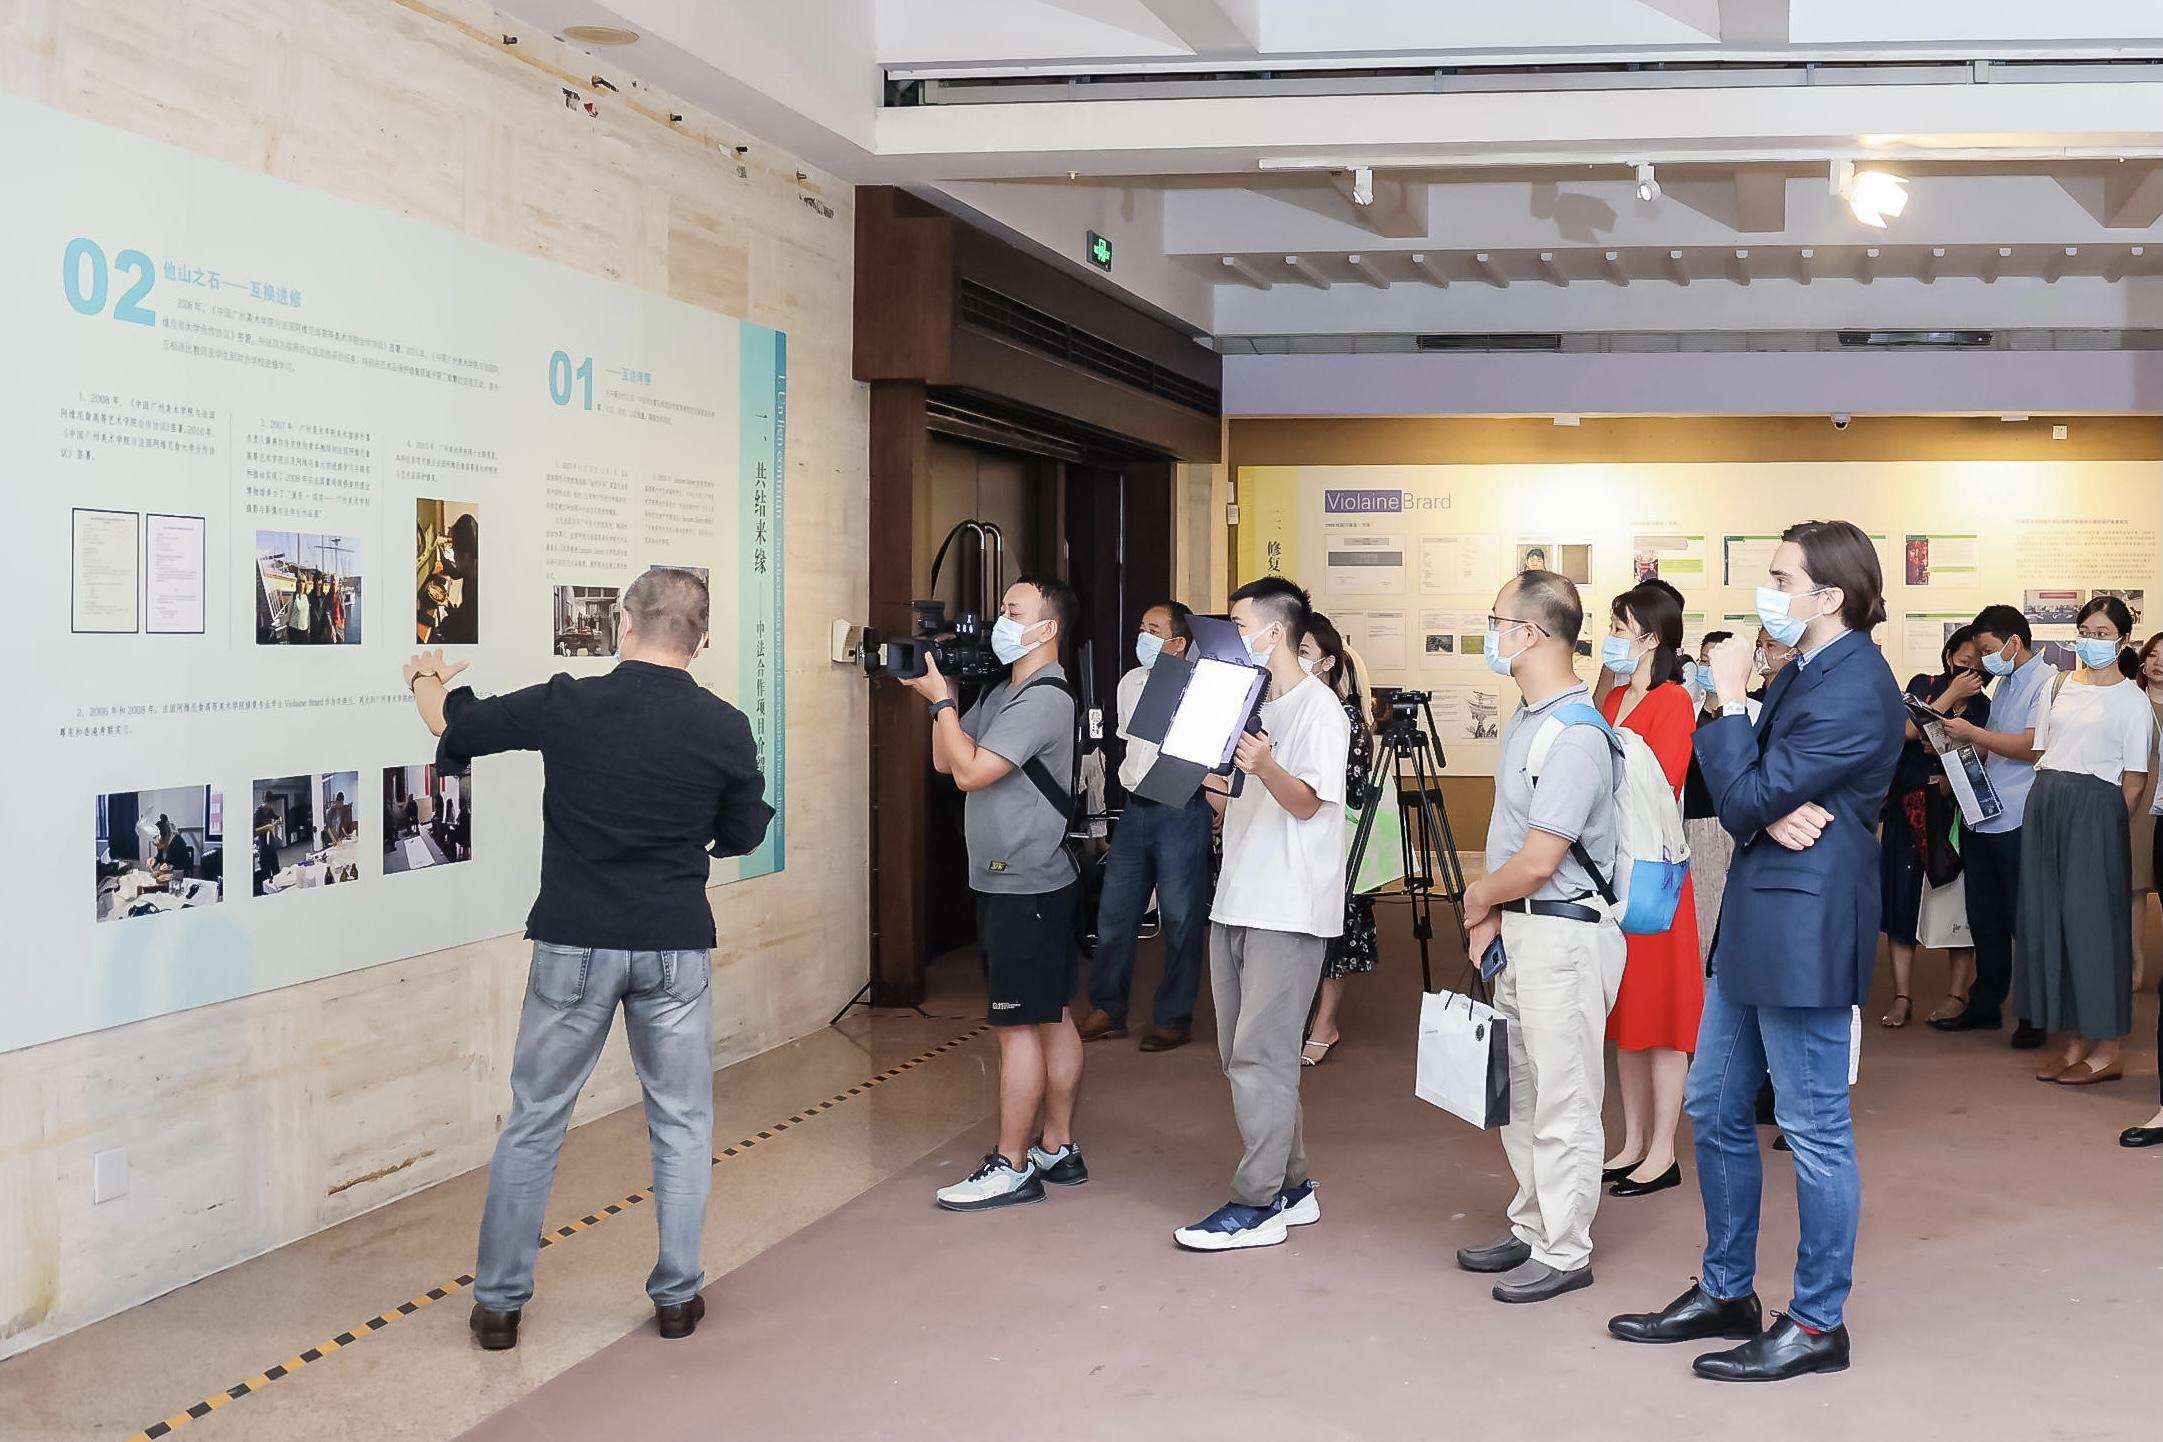 展览信息:回响——中法文物艺术品保护修复交流展   Exhibition Info: Écho - Rétrospective sur la Collaboration Franco-Chinoise en Matière de Restauration des Oeuvres D'art